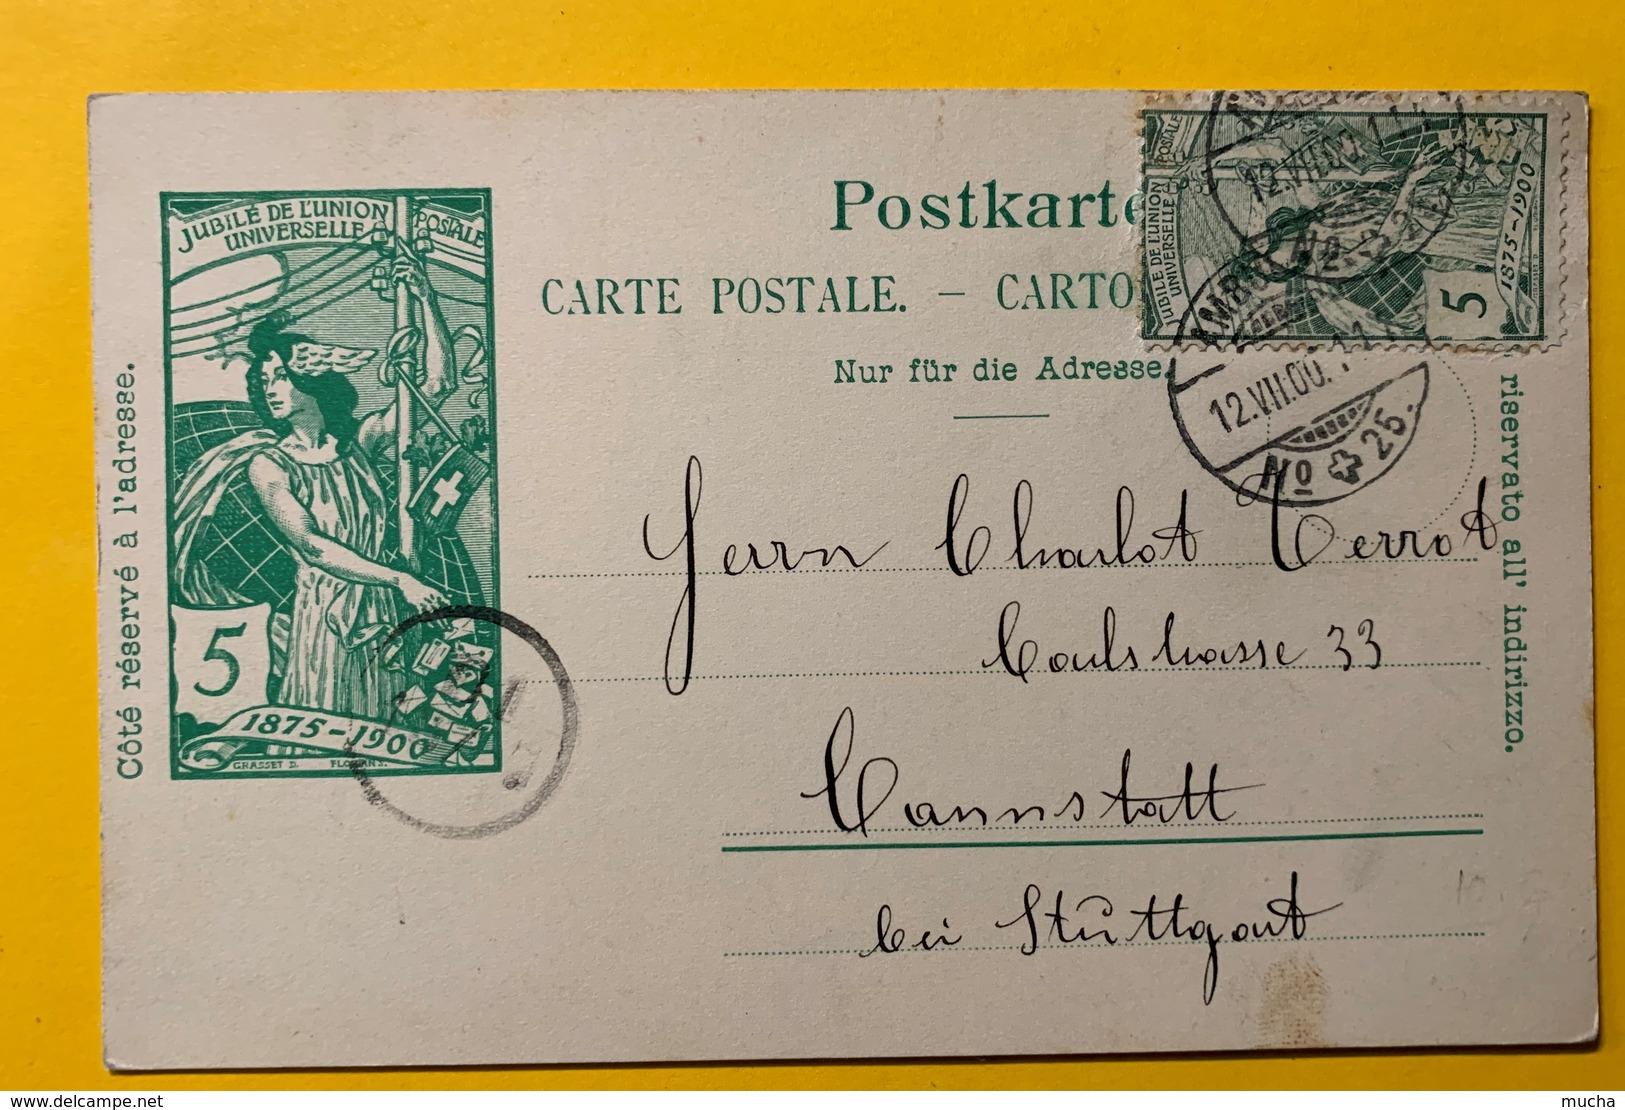 9286 - Jubilé UPU 5 Ct Vert + Timbre UPU Ambulant 12.07.1900 - Entiers Postaux